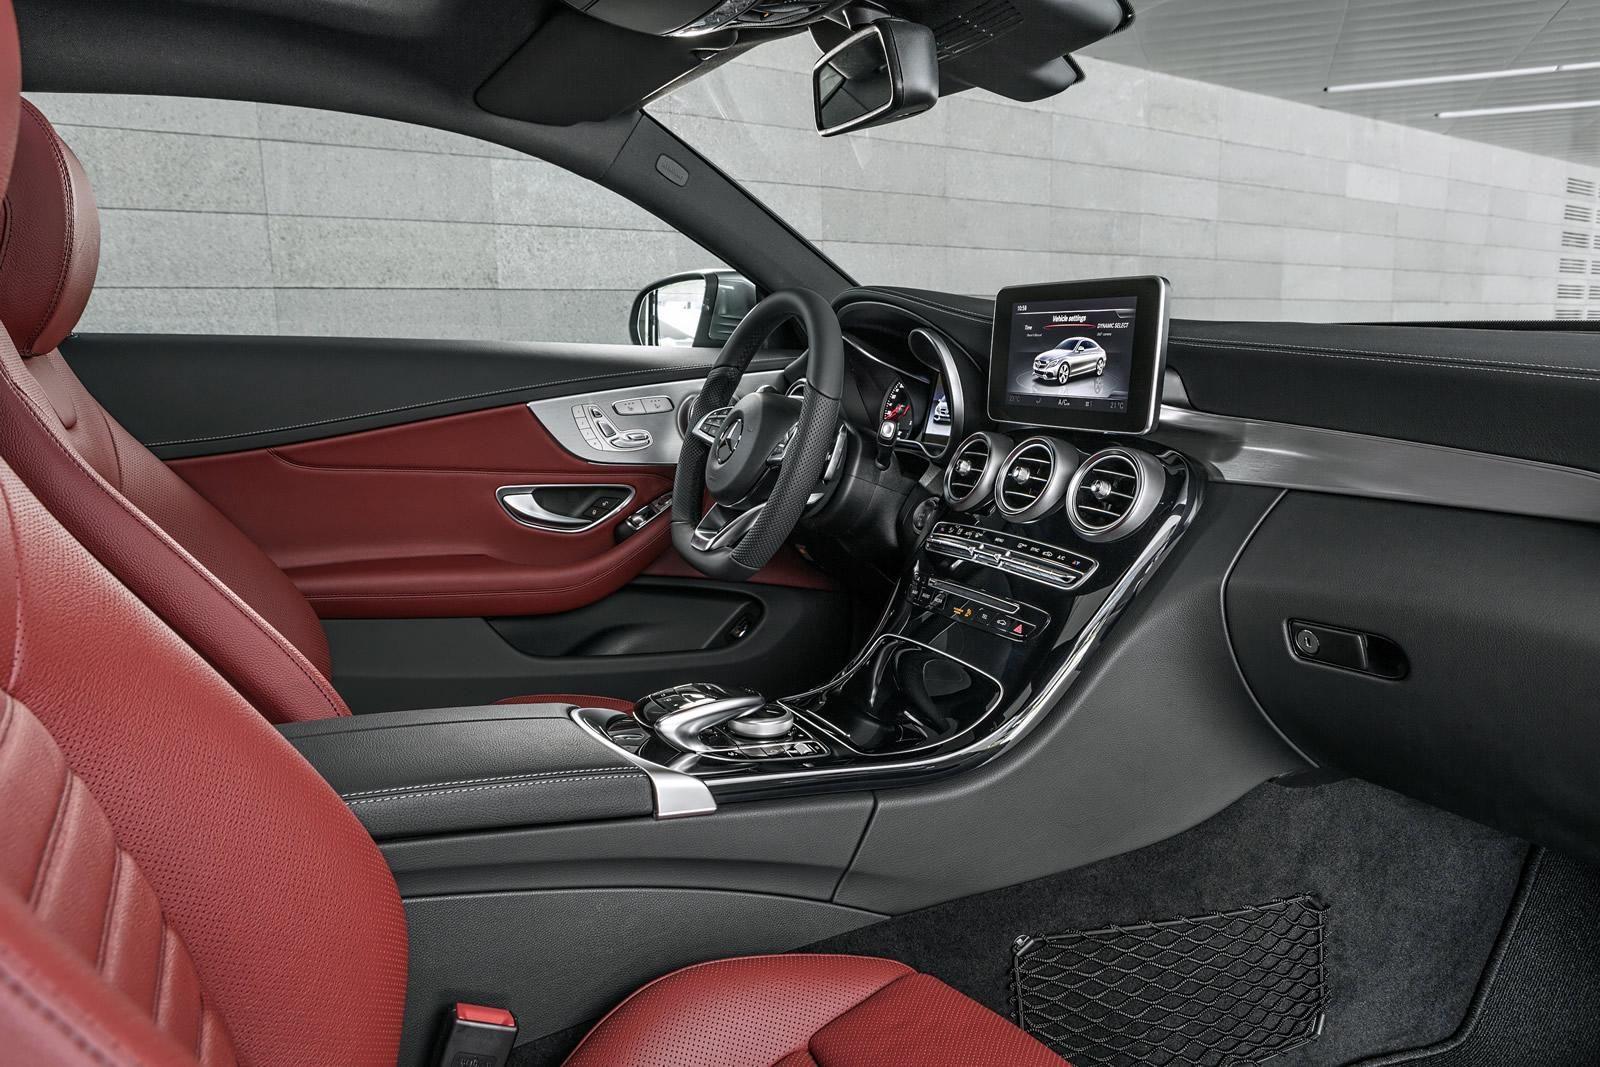 Image Result For Red Mercedes Glc Interior Benz C Mercedes Benz